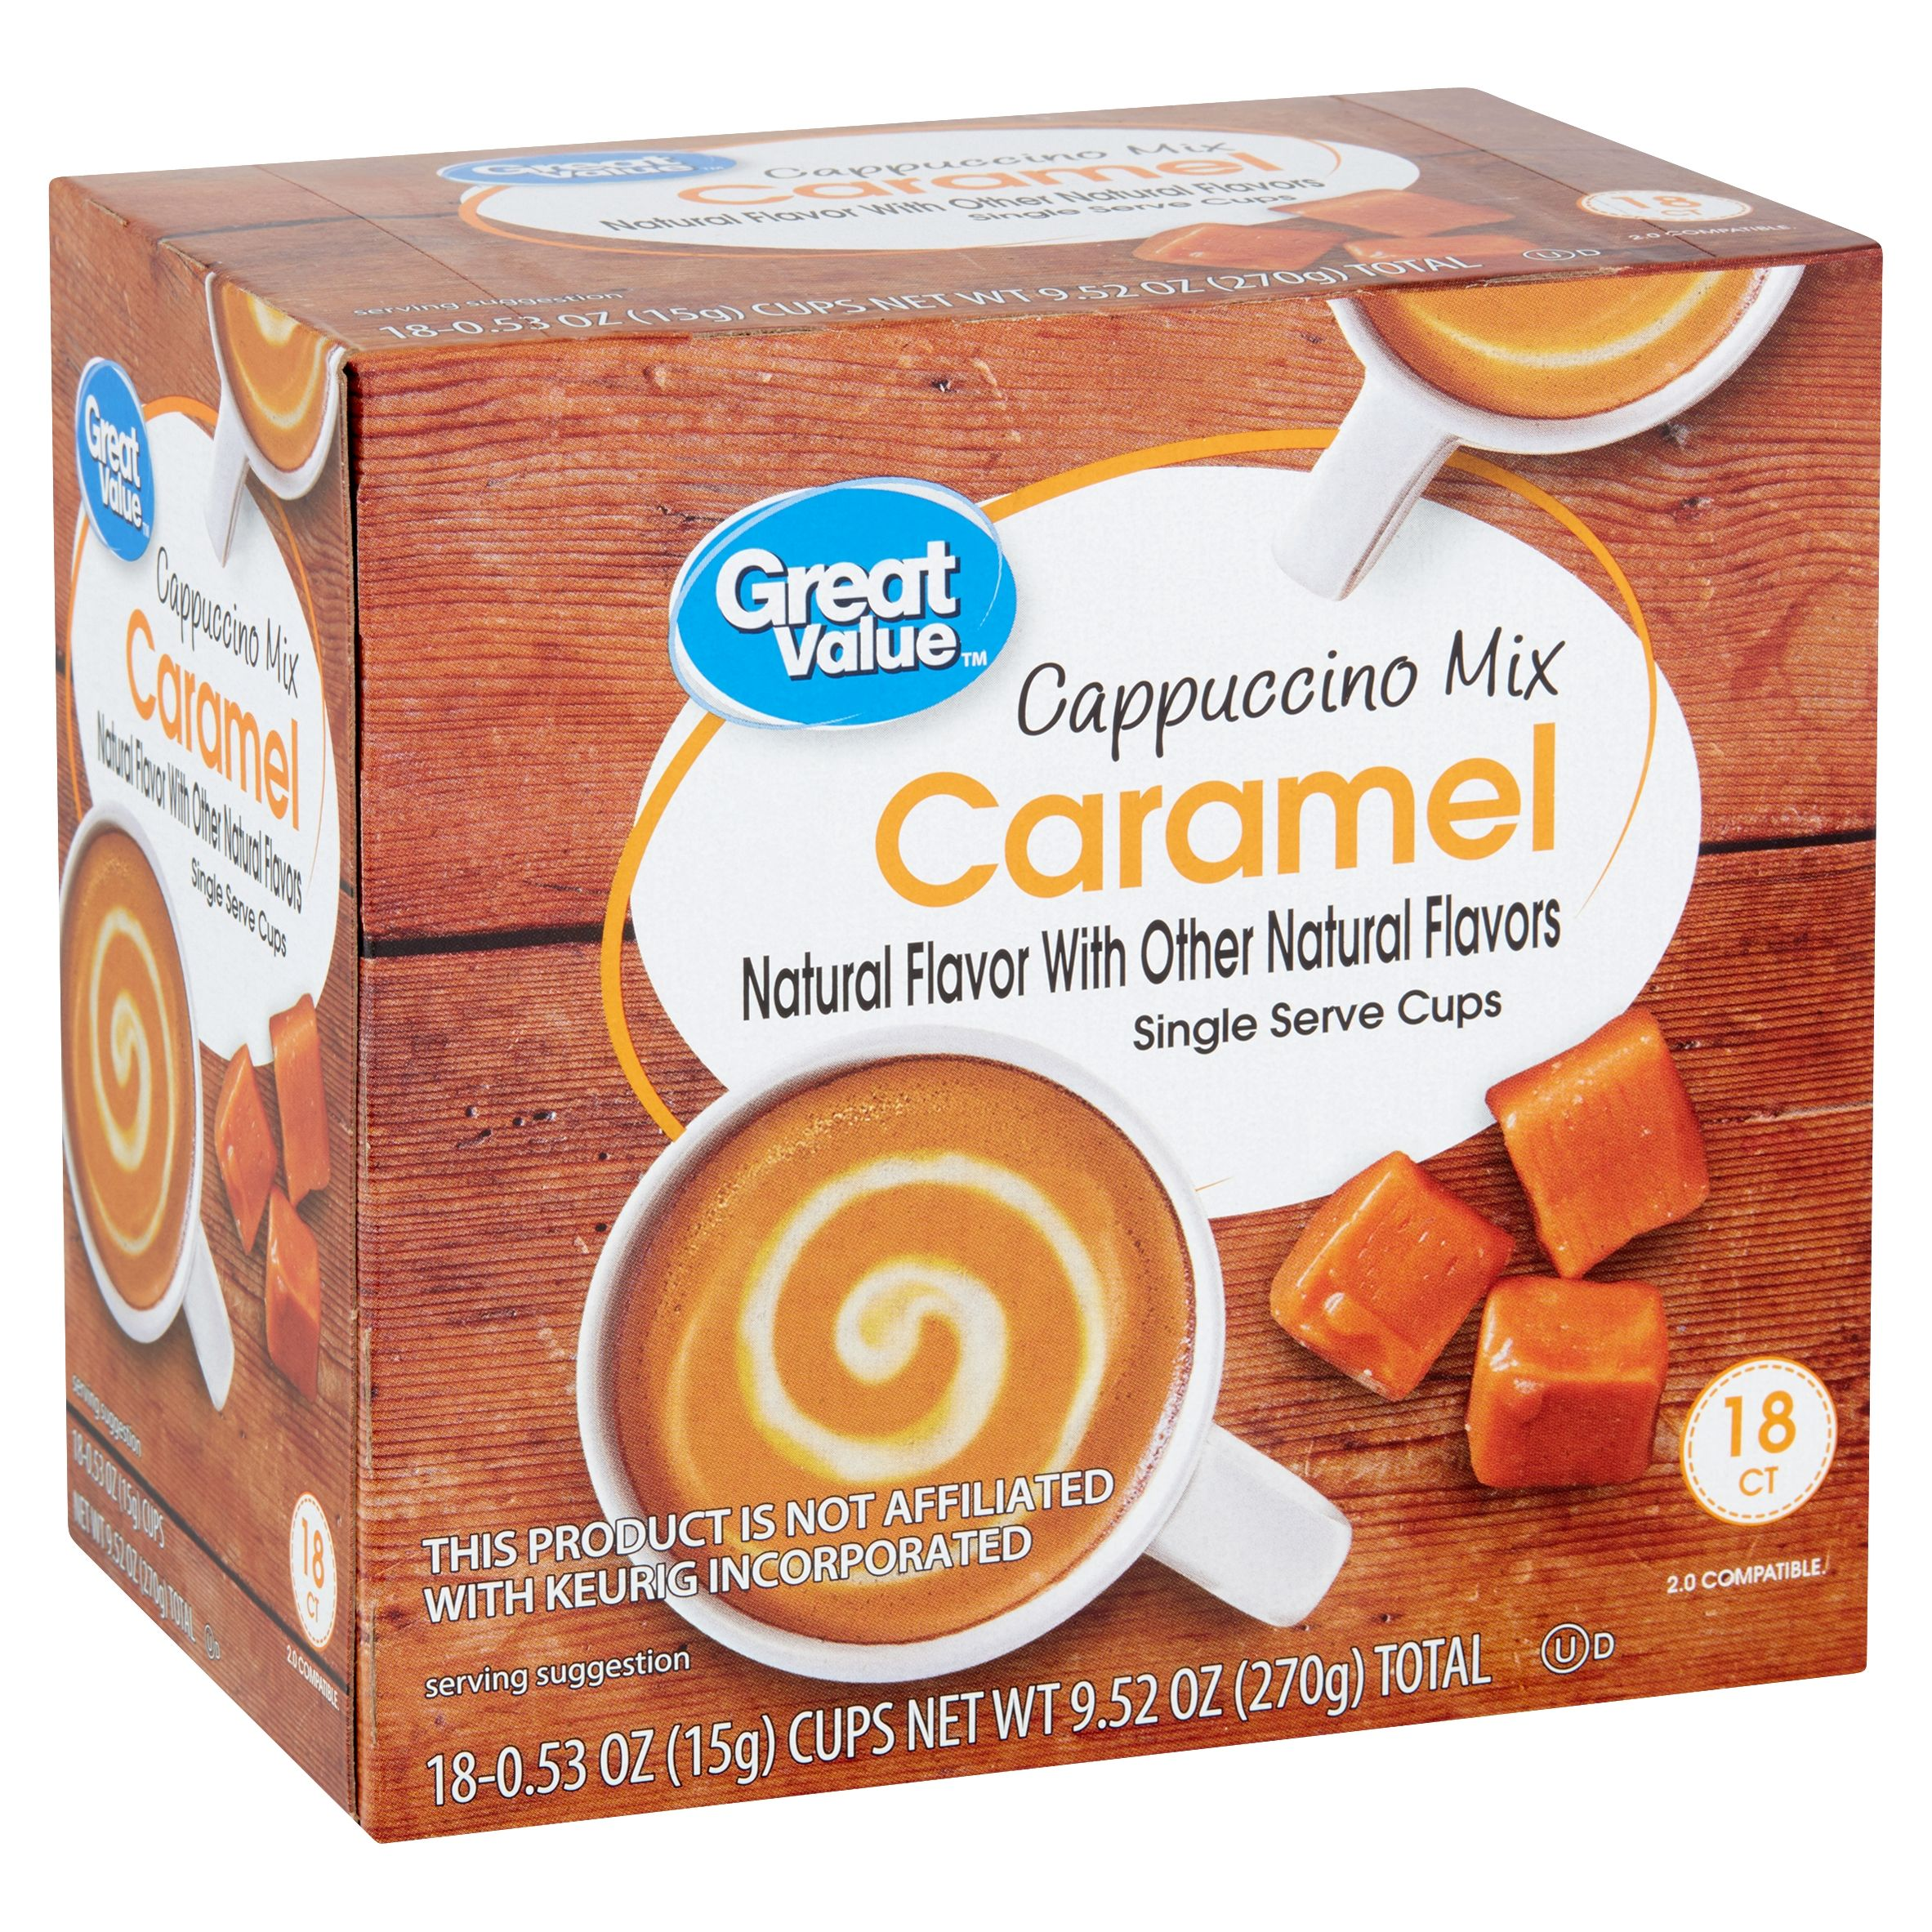 Great Value Caramel Cappuccino Mix Coffee Pods, Medium Roast, 18 Count